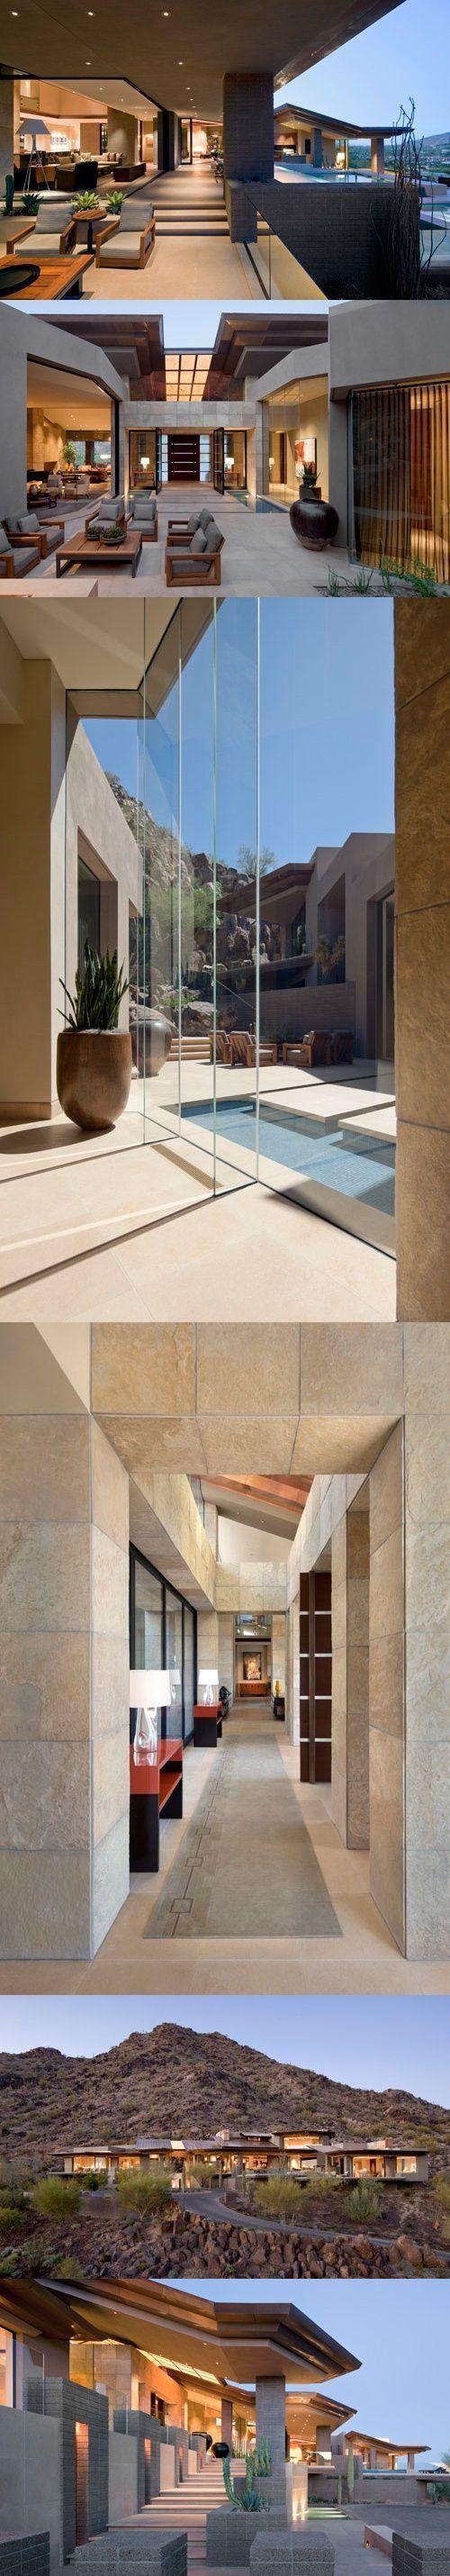 Home design bilder im inneren  best attic loft conversions images on pinterest  attic spaces